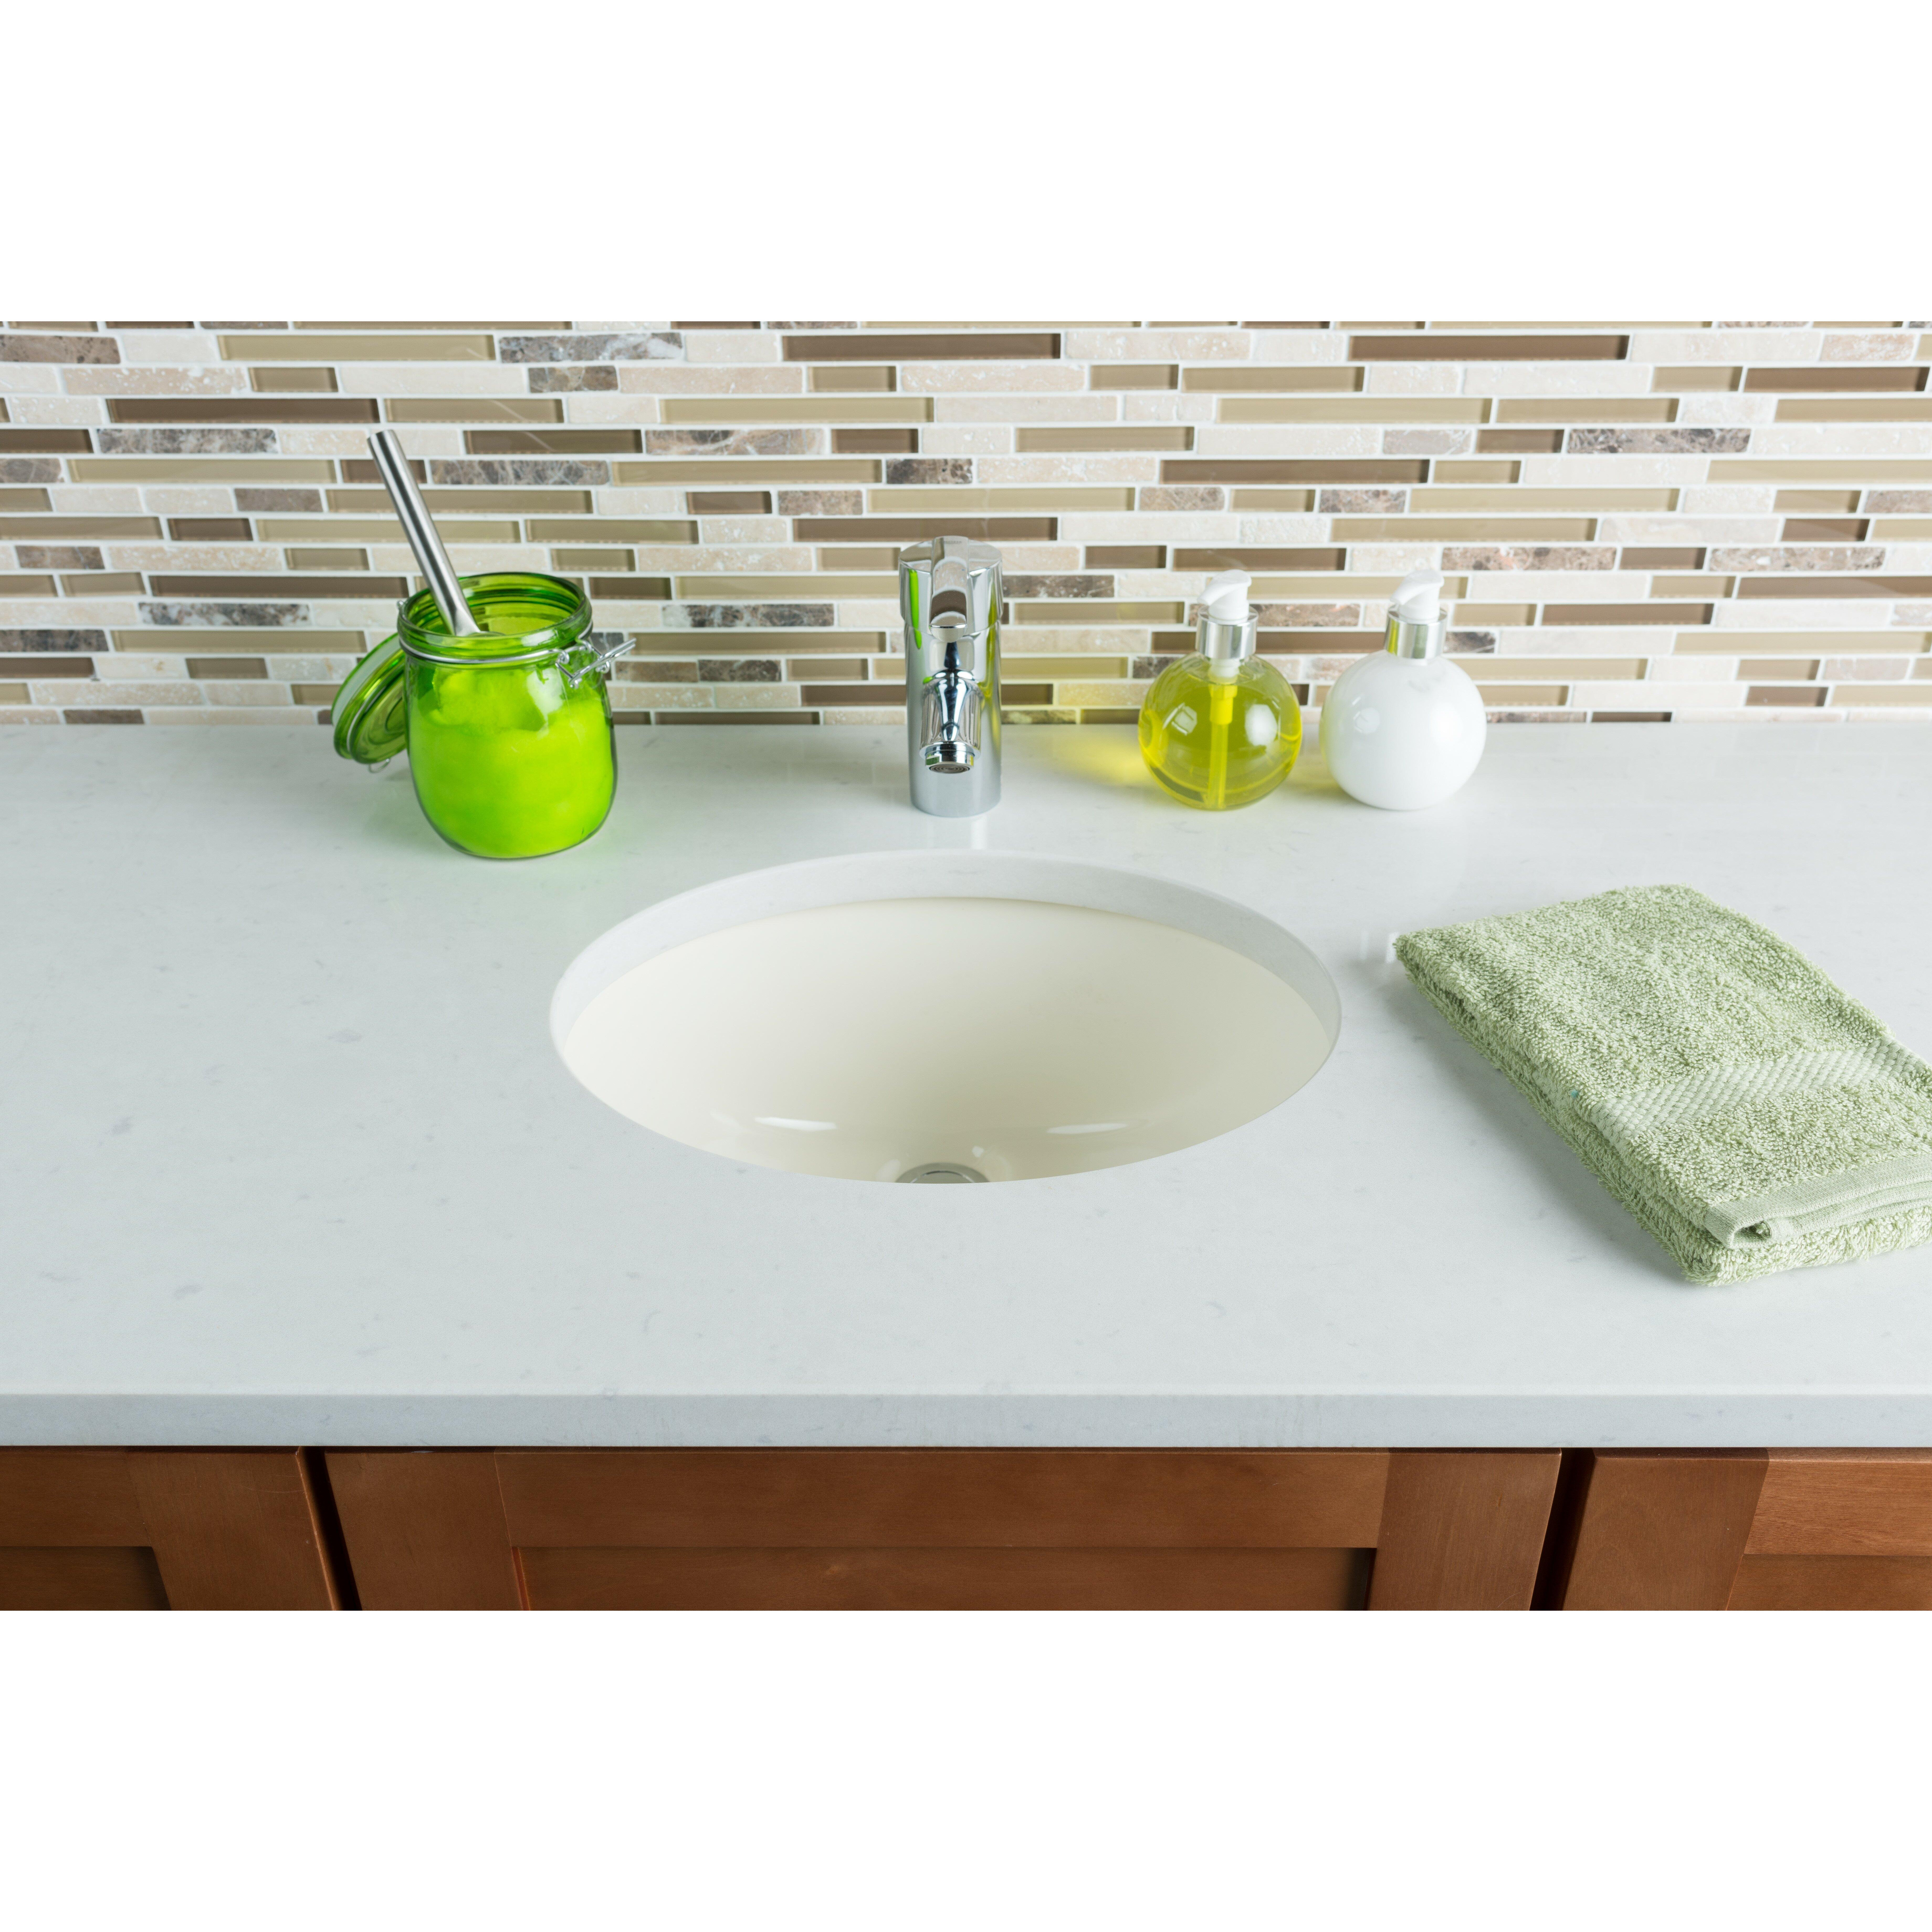 Hahn Ceramic Bowl Bathroom Sink & Reviews